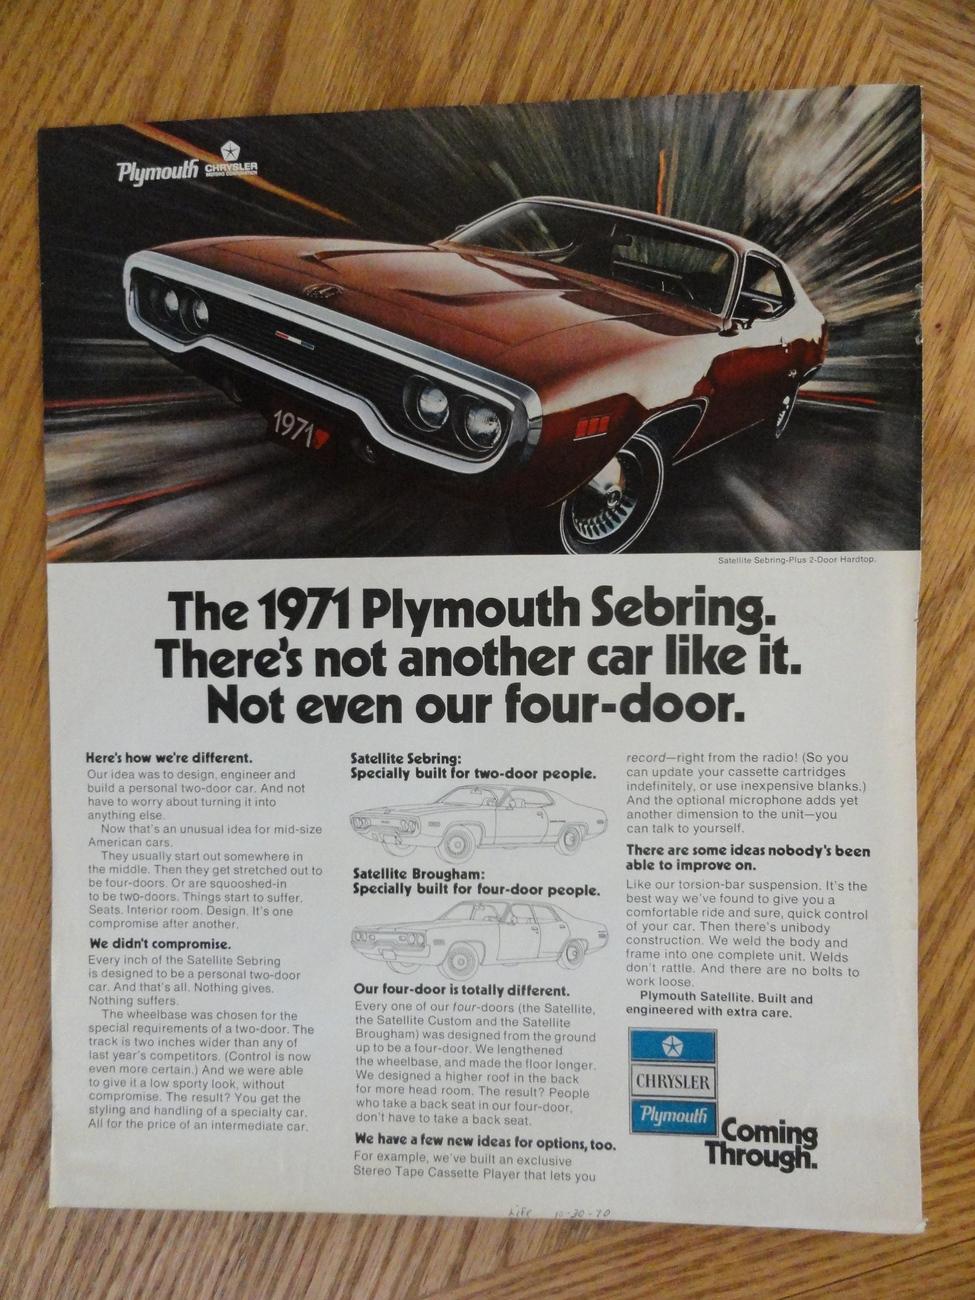 1971 Plymouth Sebring Oringial magazine print ad. 10 1/2